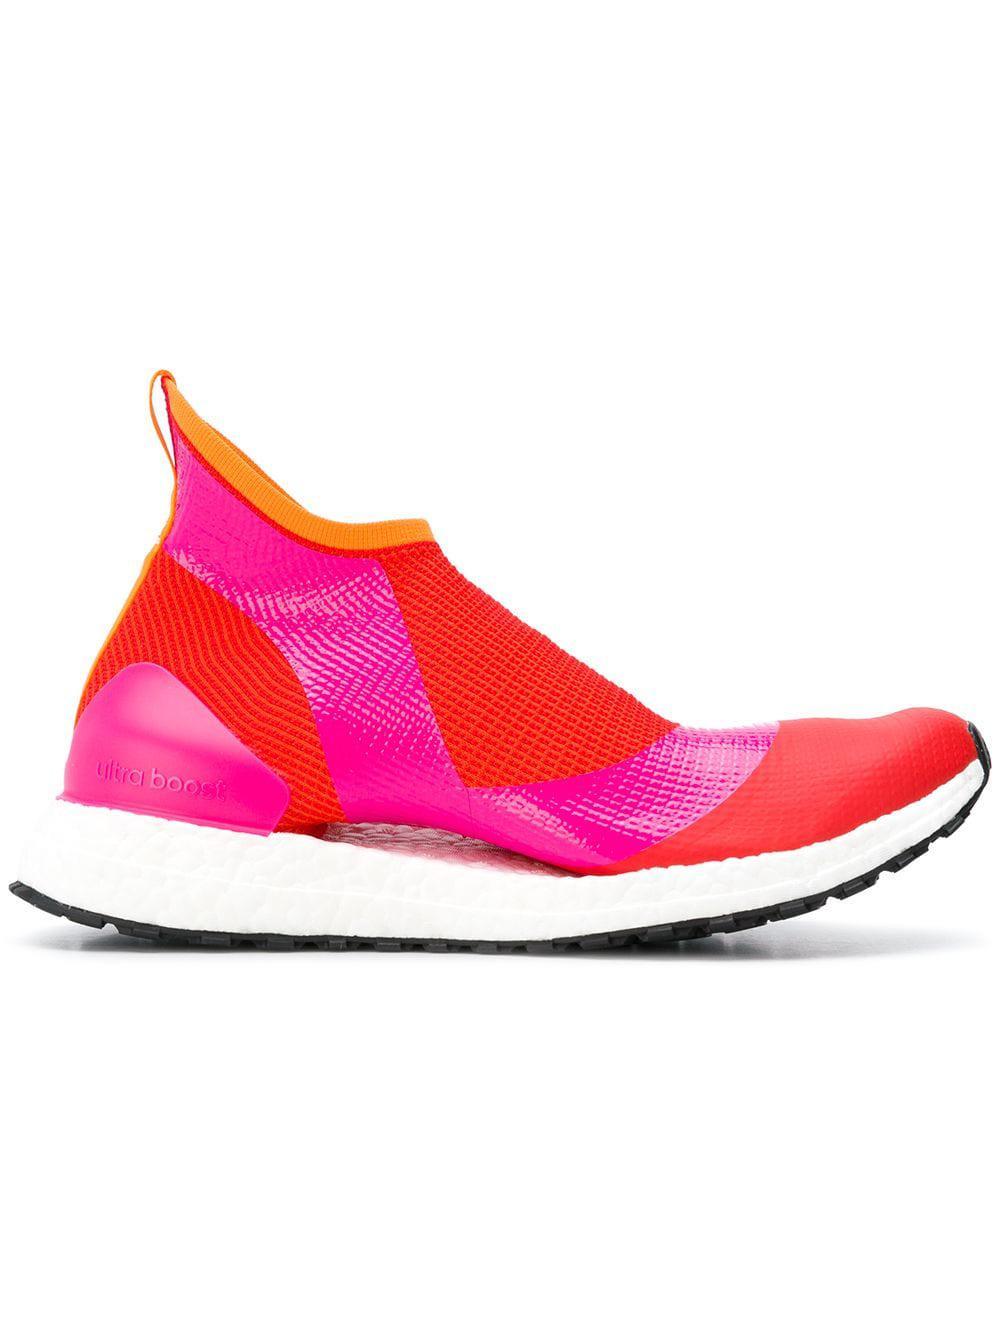 the latest 86eff b883f Adidas By Stella Mccartney Ultraboost Sock Sneakers in Yellow - Lyst